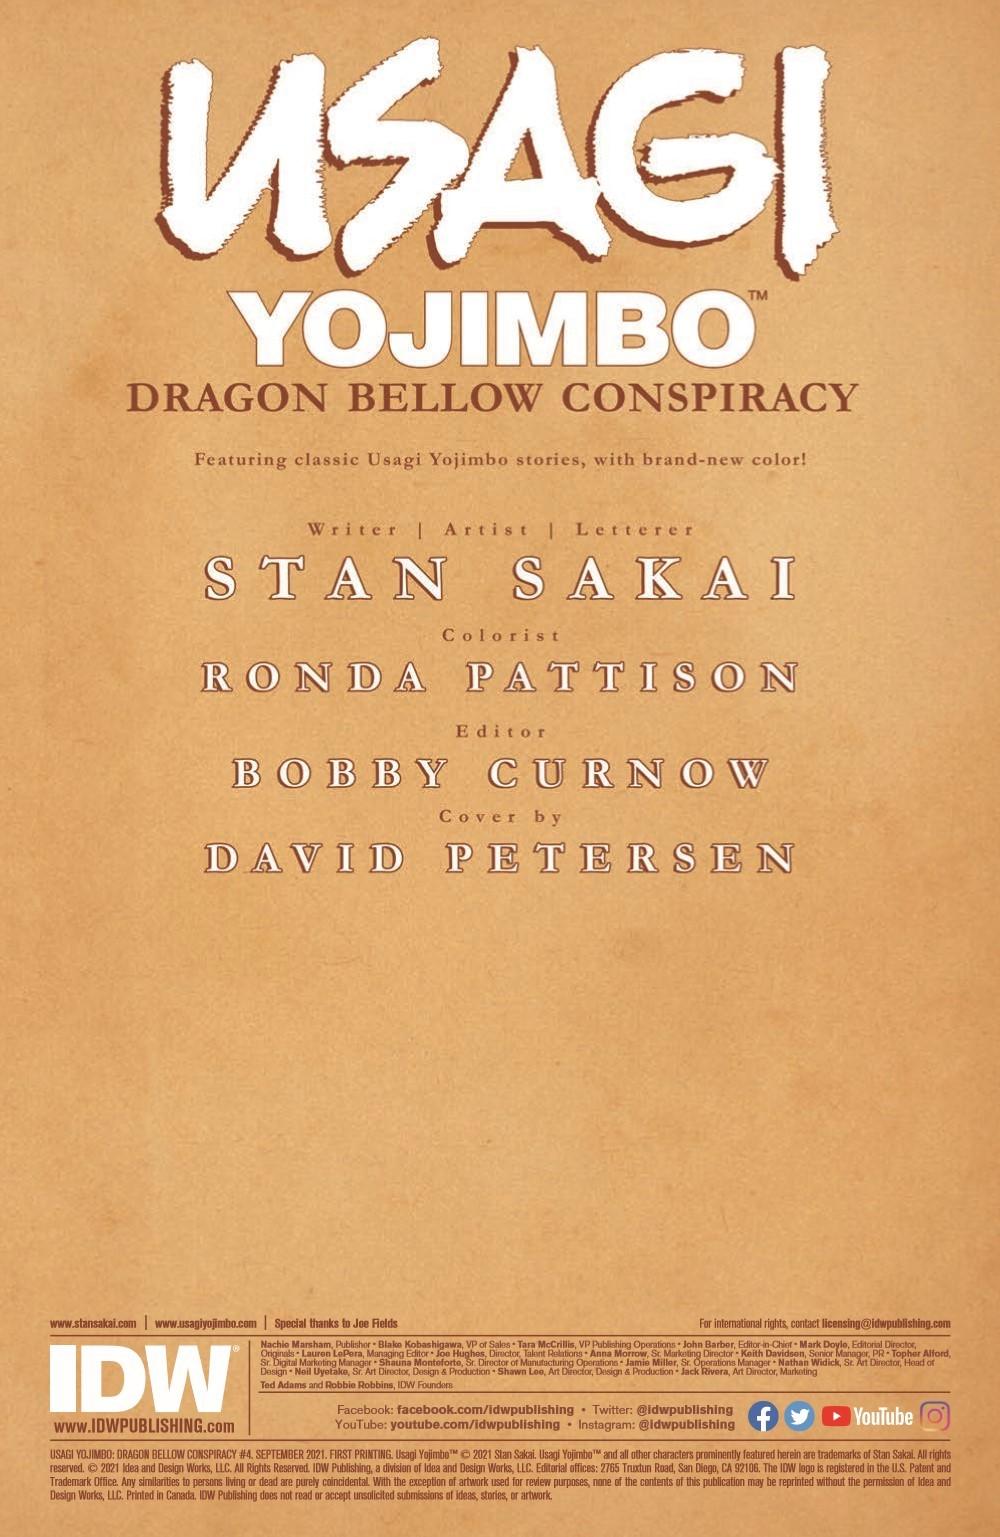 Usagi-DBC04_pr-2 ComicList Previews: USAGI YOJIMBO THE DRAGON BELLOW CONSPIRACY #4 (OF 6)